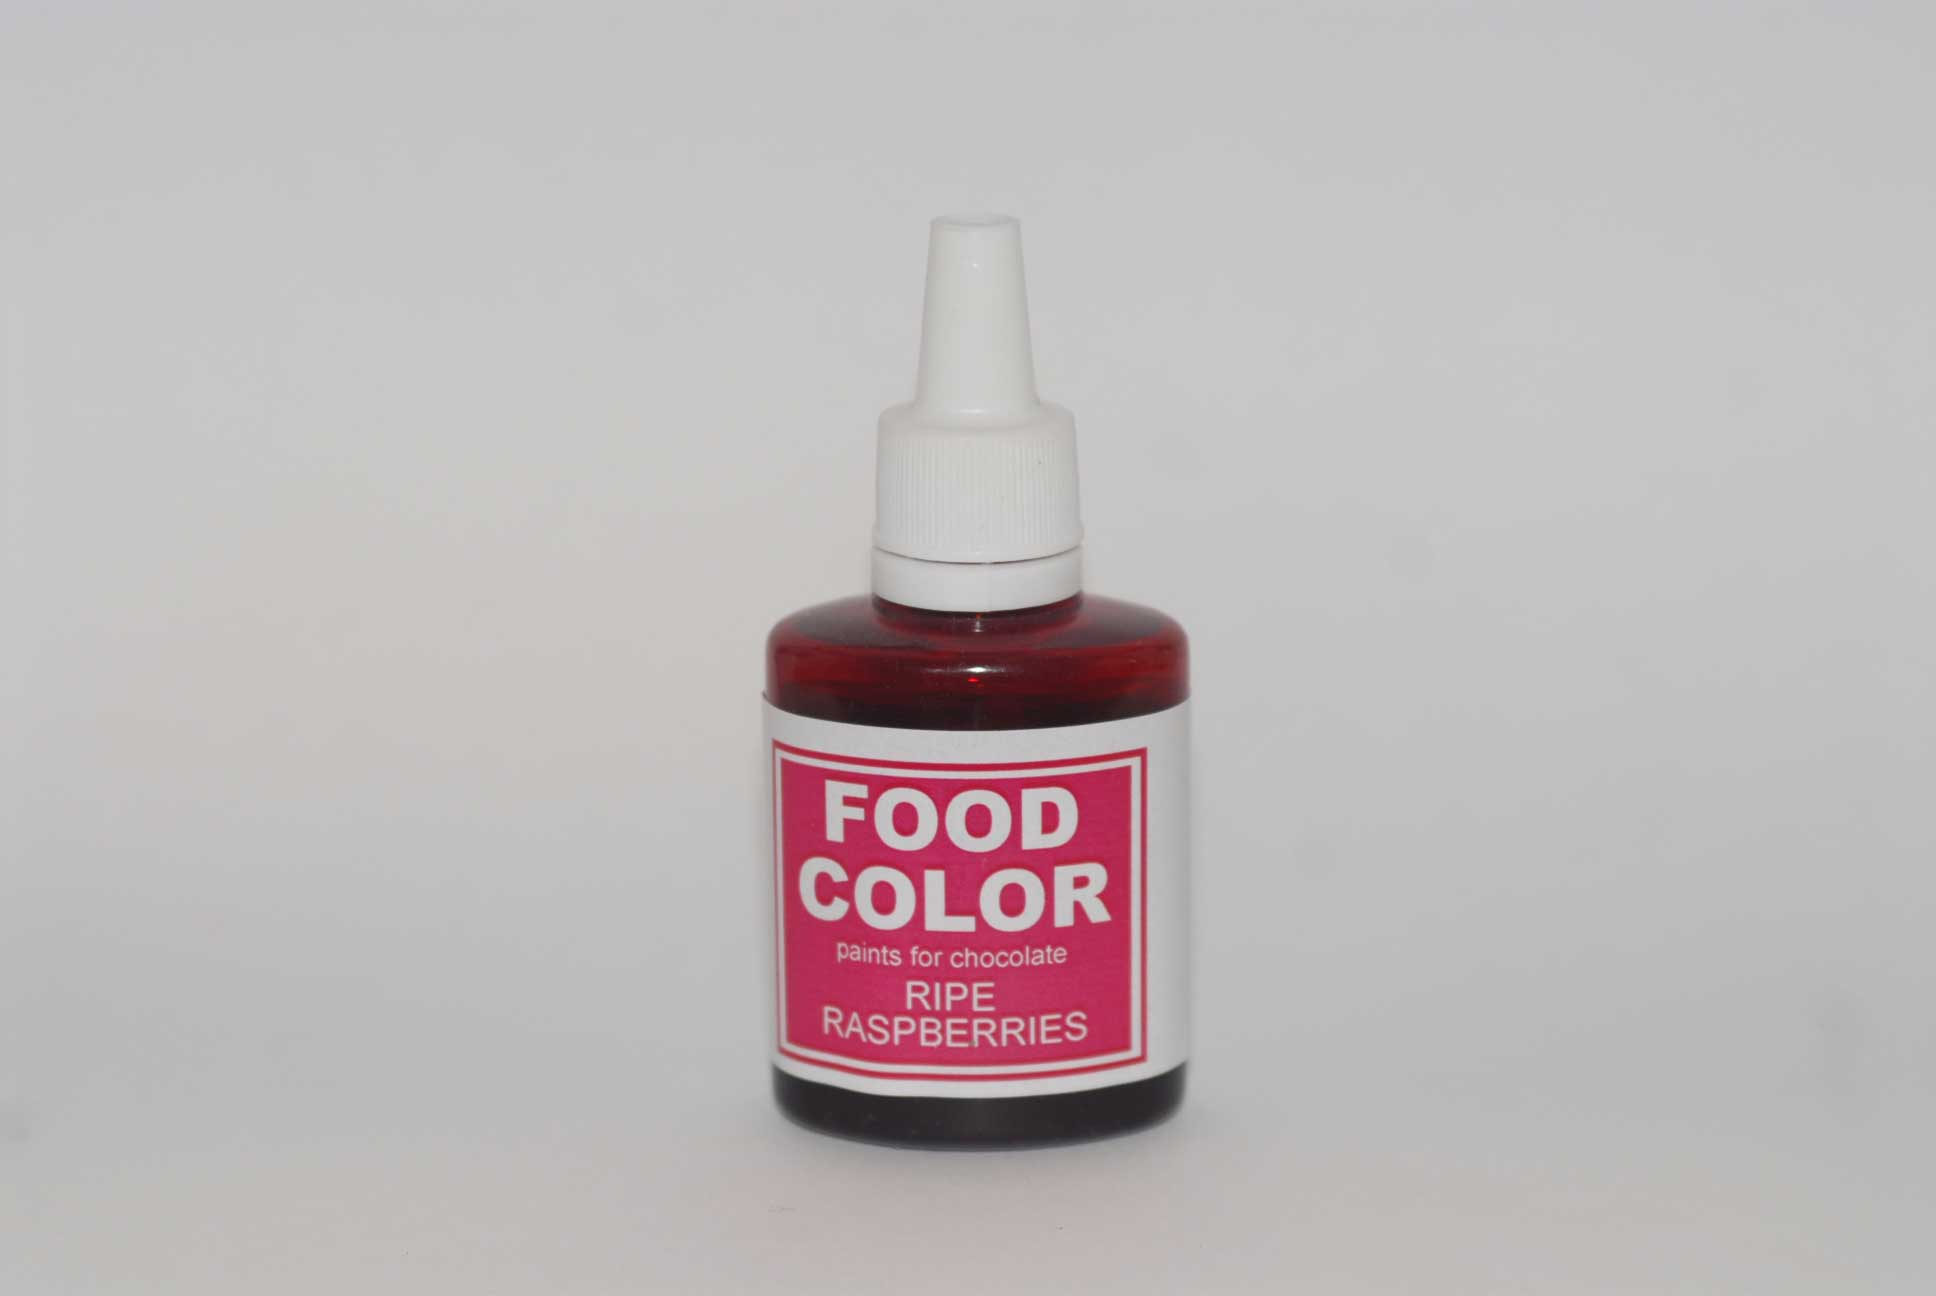 Краситель для шоколада FOOD COLOR Ripe Raspberries / Спелая Малина , 25 гр